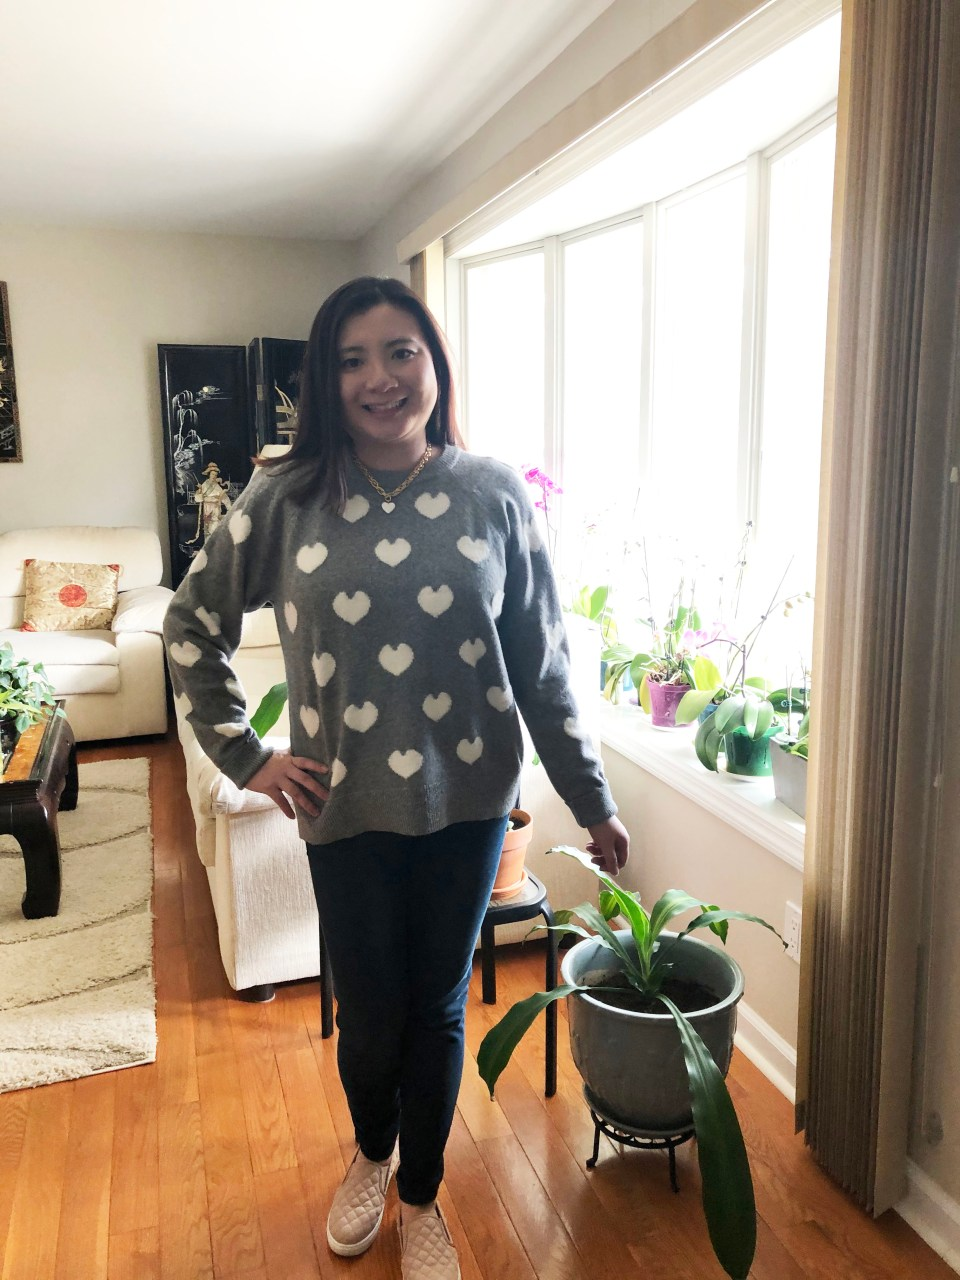 White Heart Sweater 1